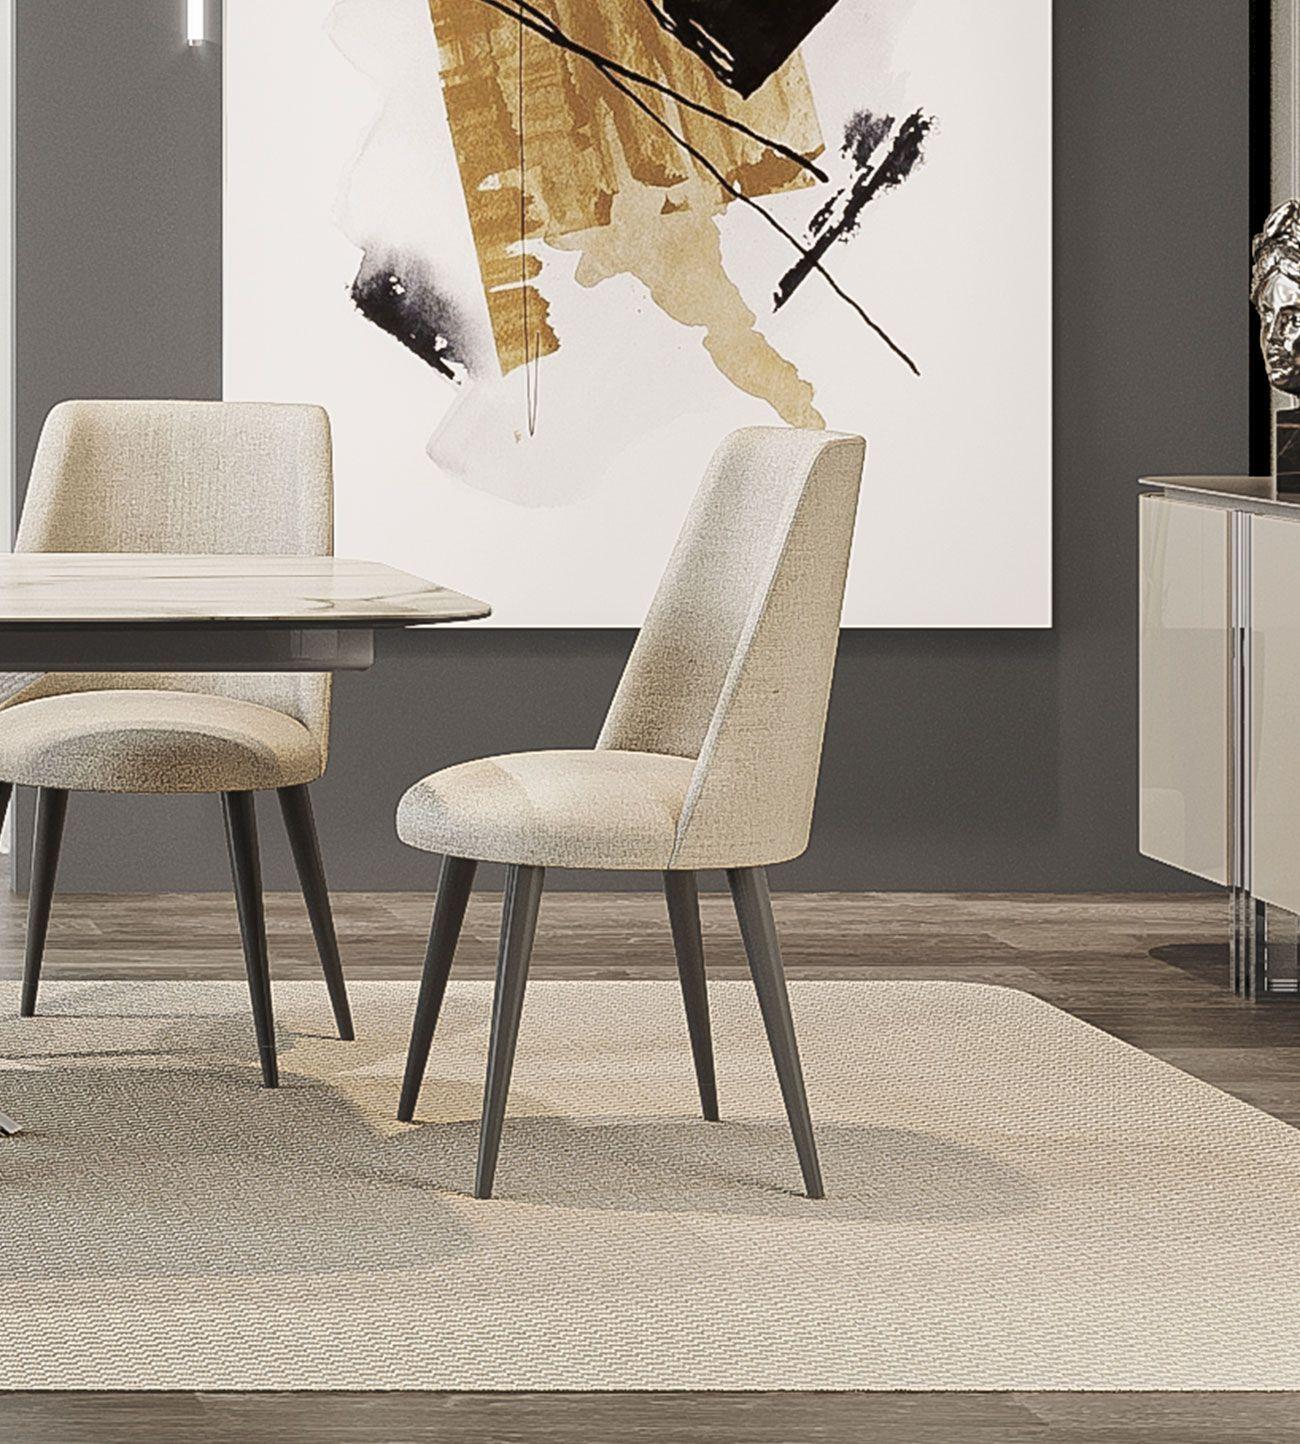 Cadeira New York, Cadeiras Graca Interiores